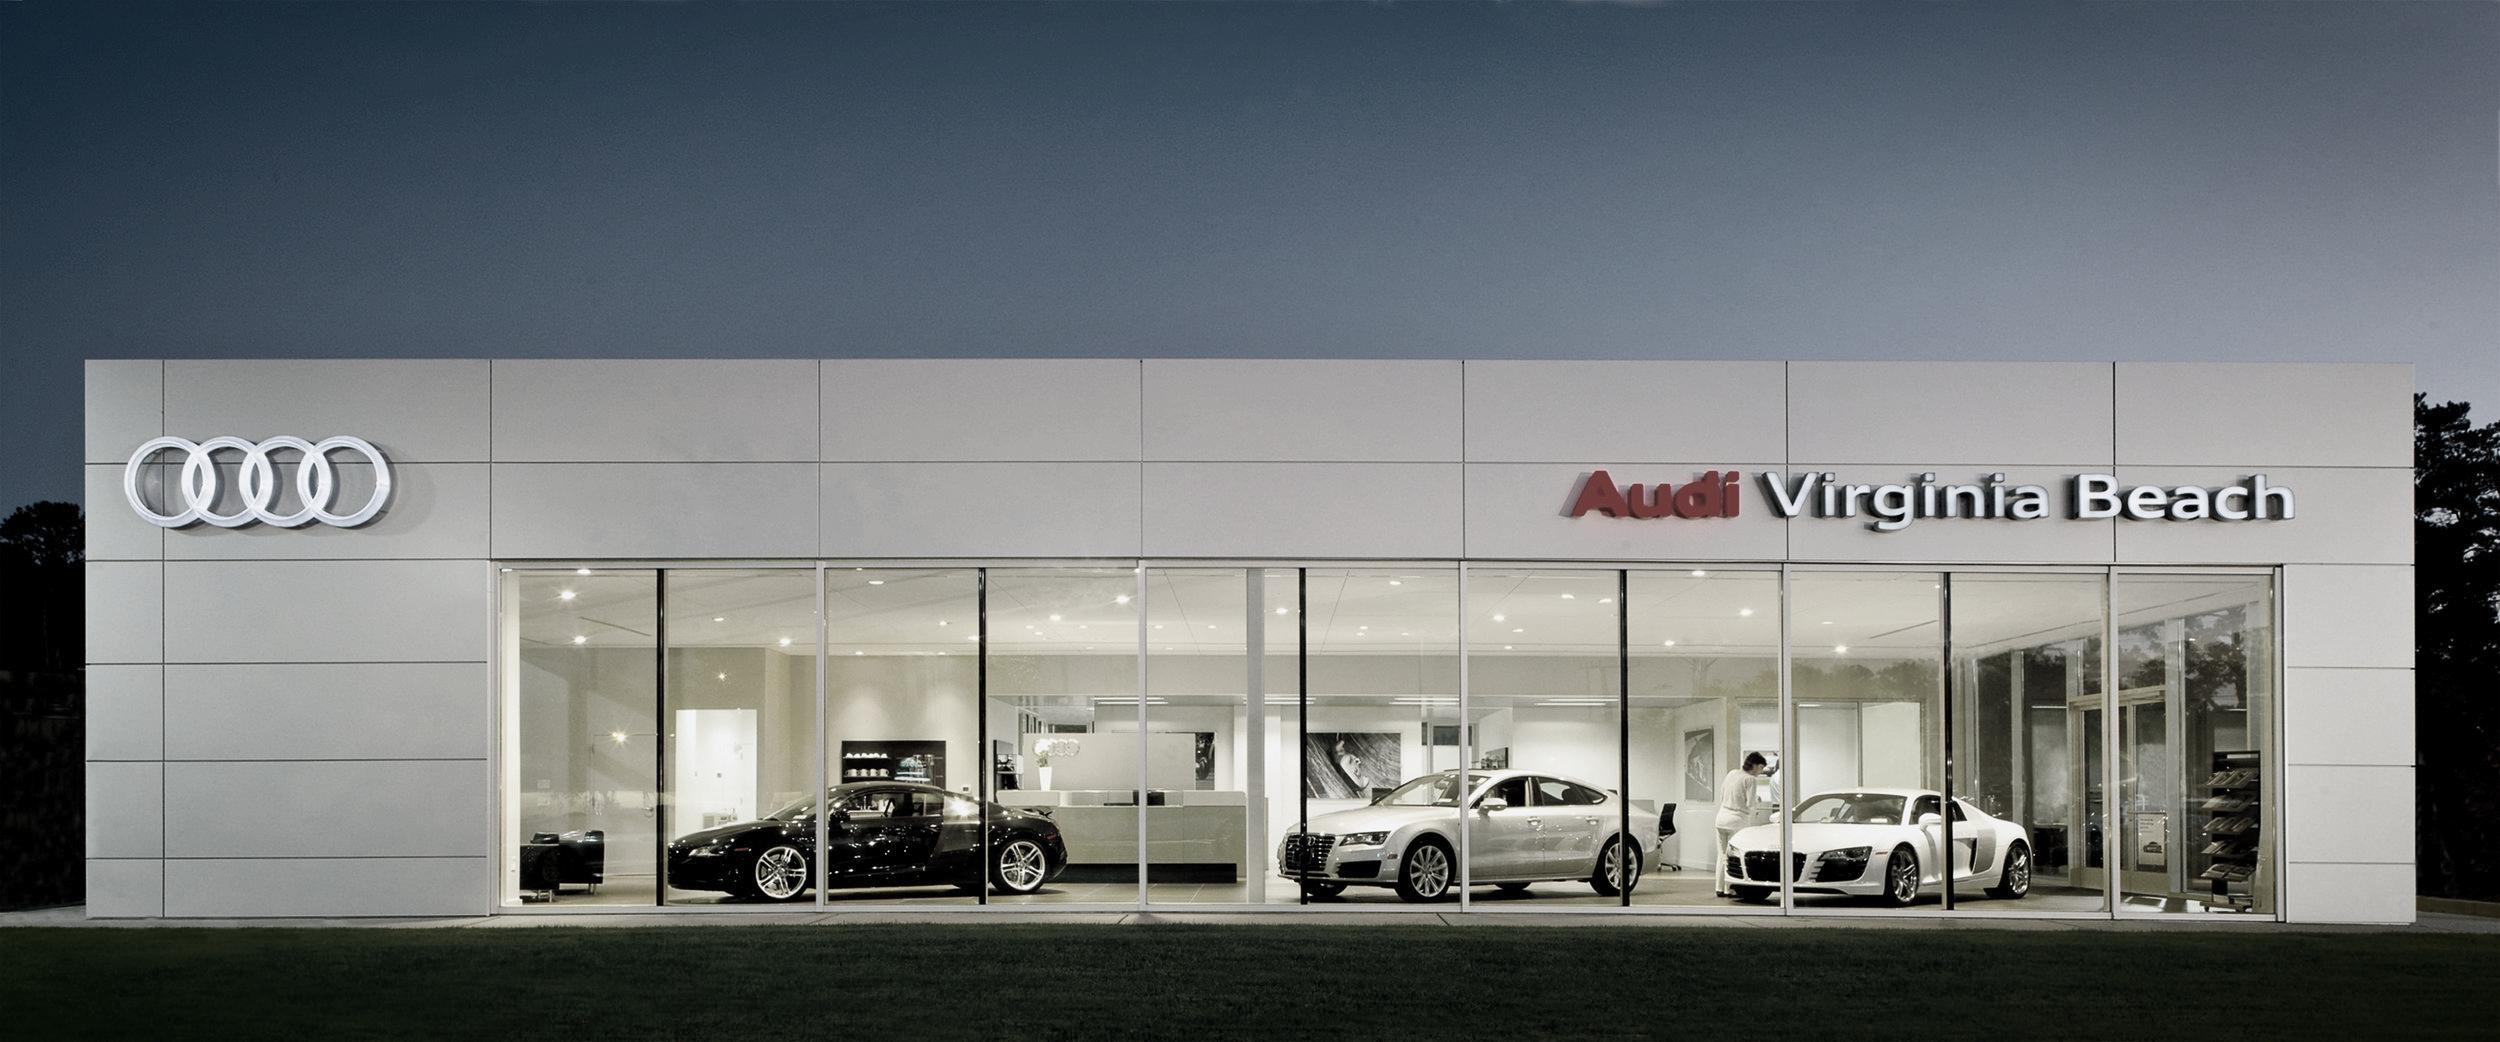 Checkered Flag Audi Lyall Design Architects - Audi virginia beach